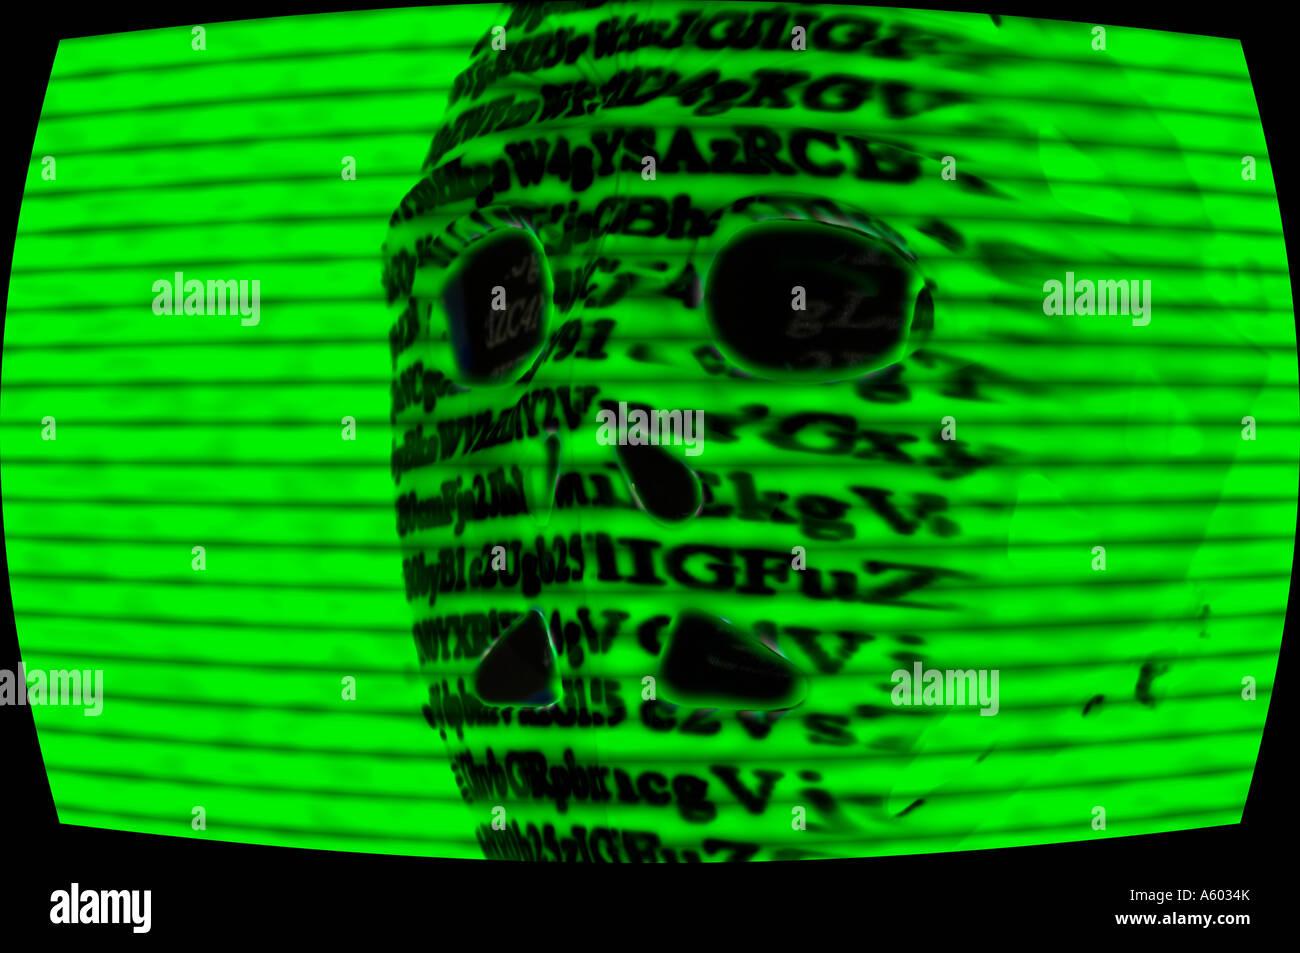 serial killer wearing ski mask shown on closed circuit security camera - Stock Image